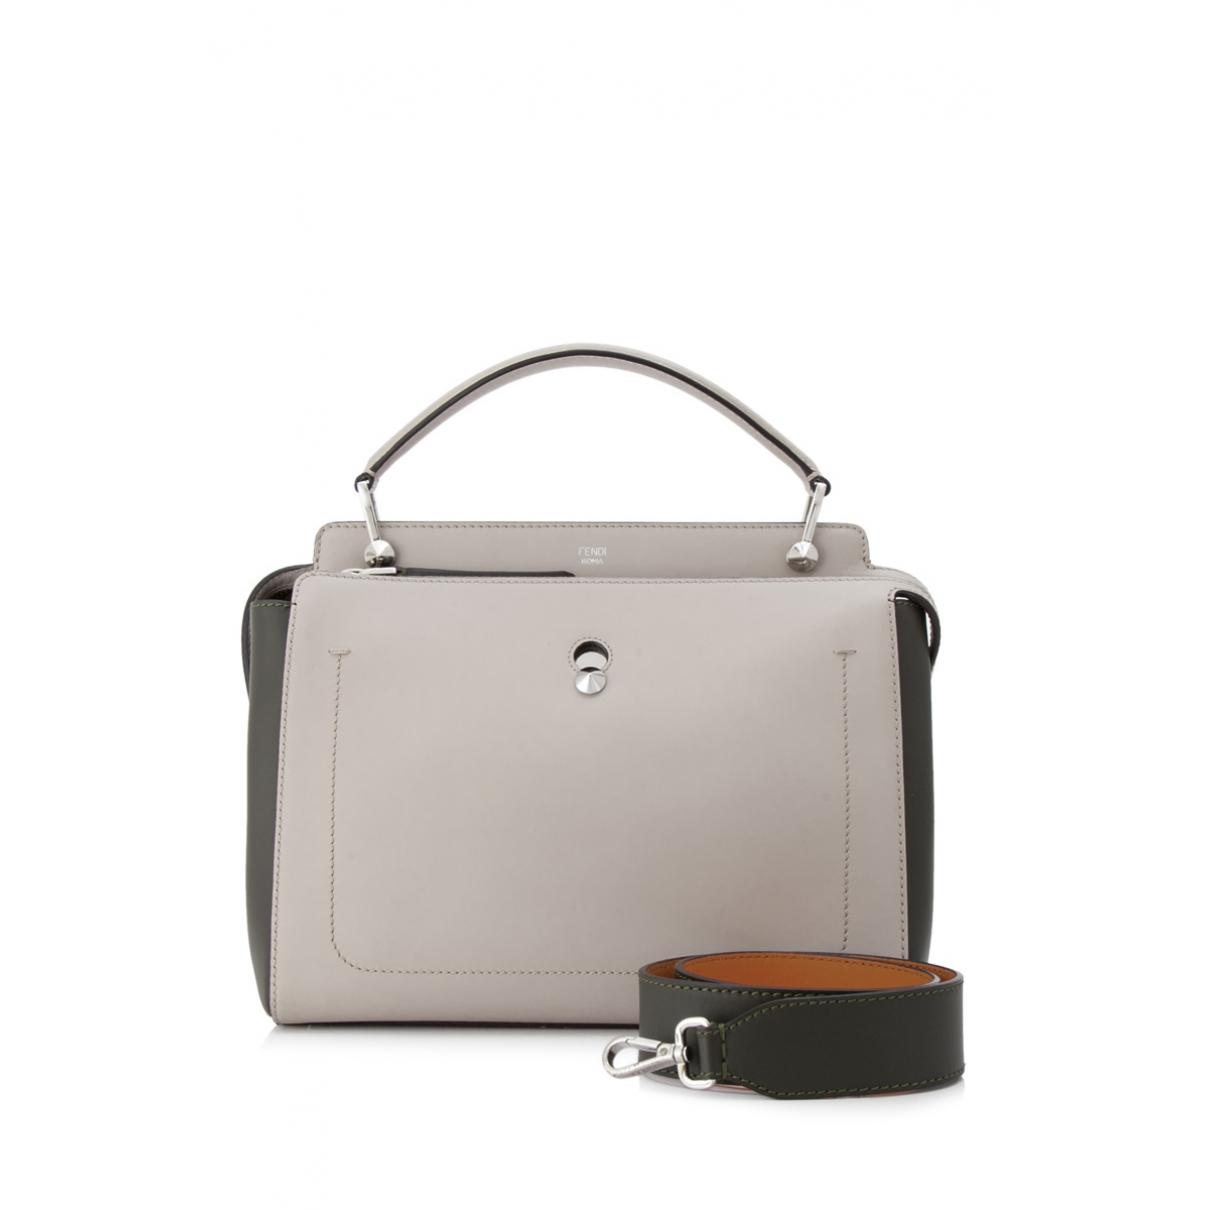 Fendi Dot Com Grey Leather handbag for Women \N